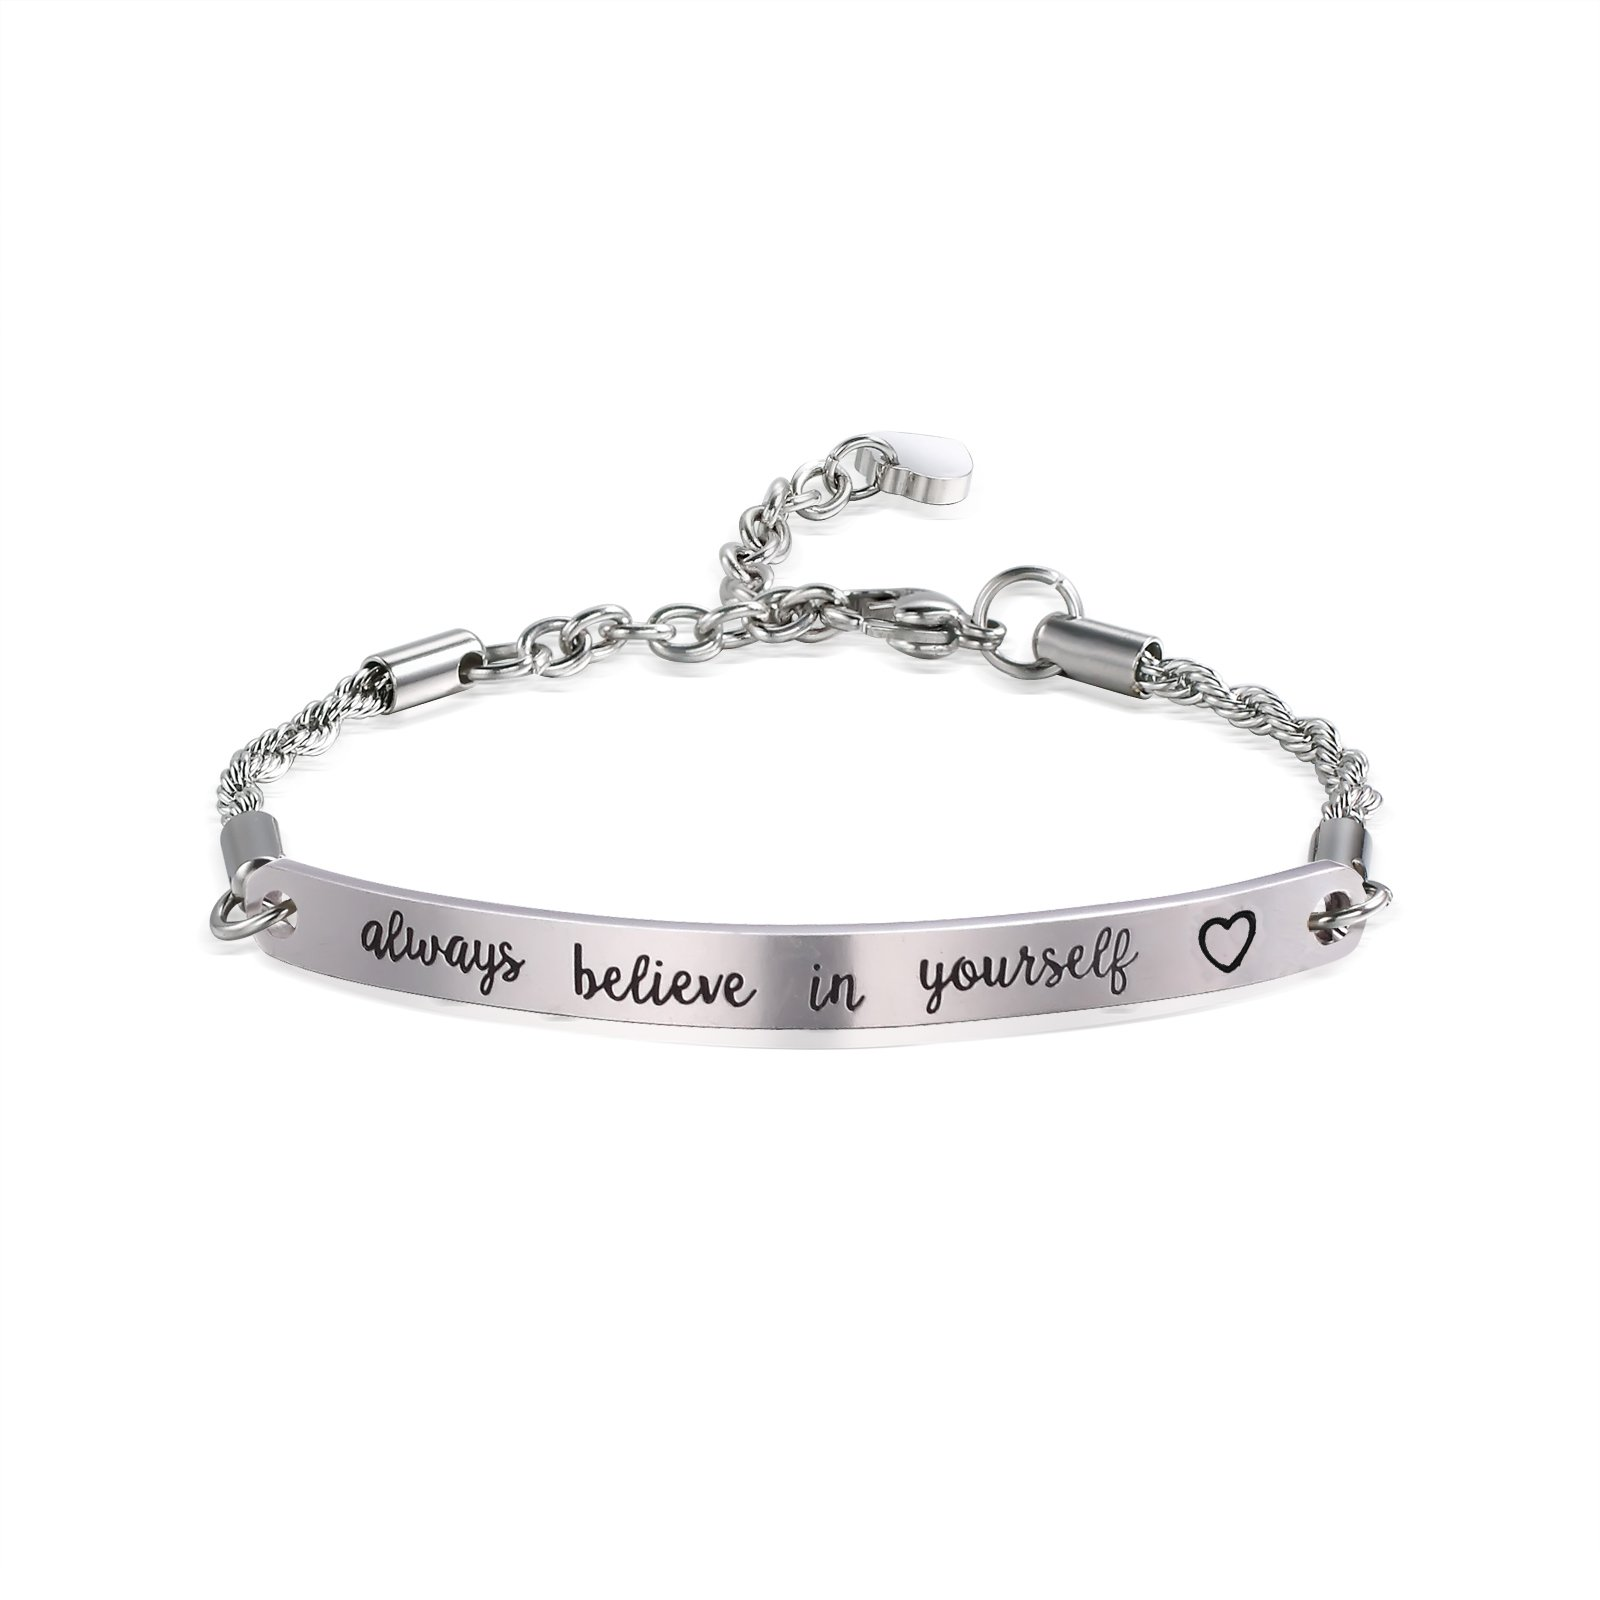 ivyAnan Inspirational Engraved Bracelet''always believe in yourself'' Quote Bar Bracelet for women, girls, friendship, gift jewlery (Silver-always believe in yourself)